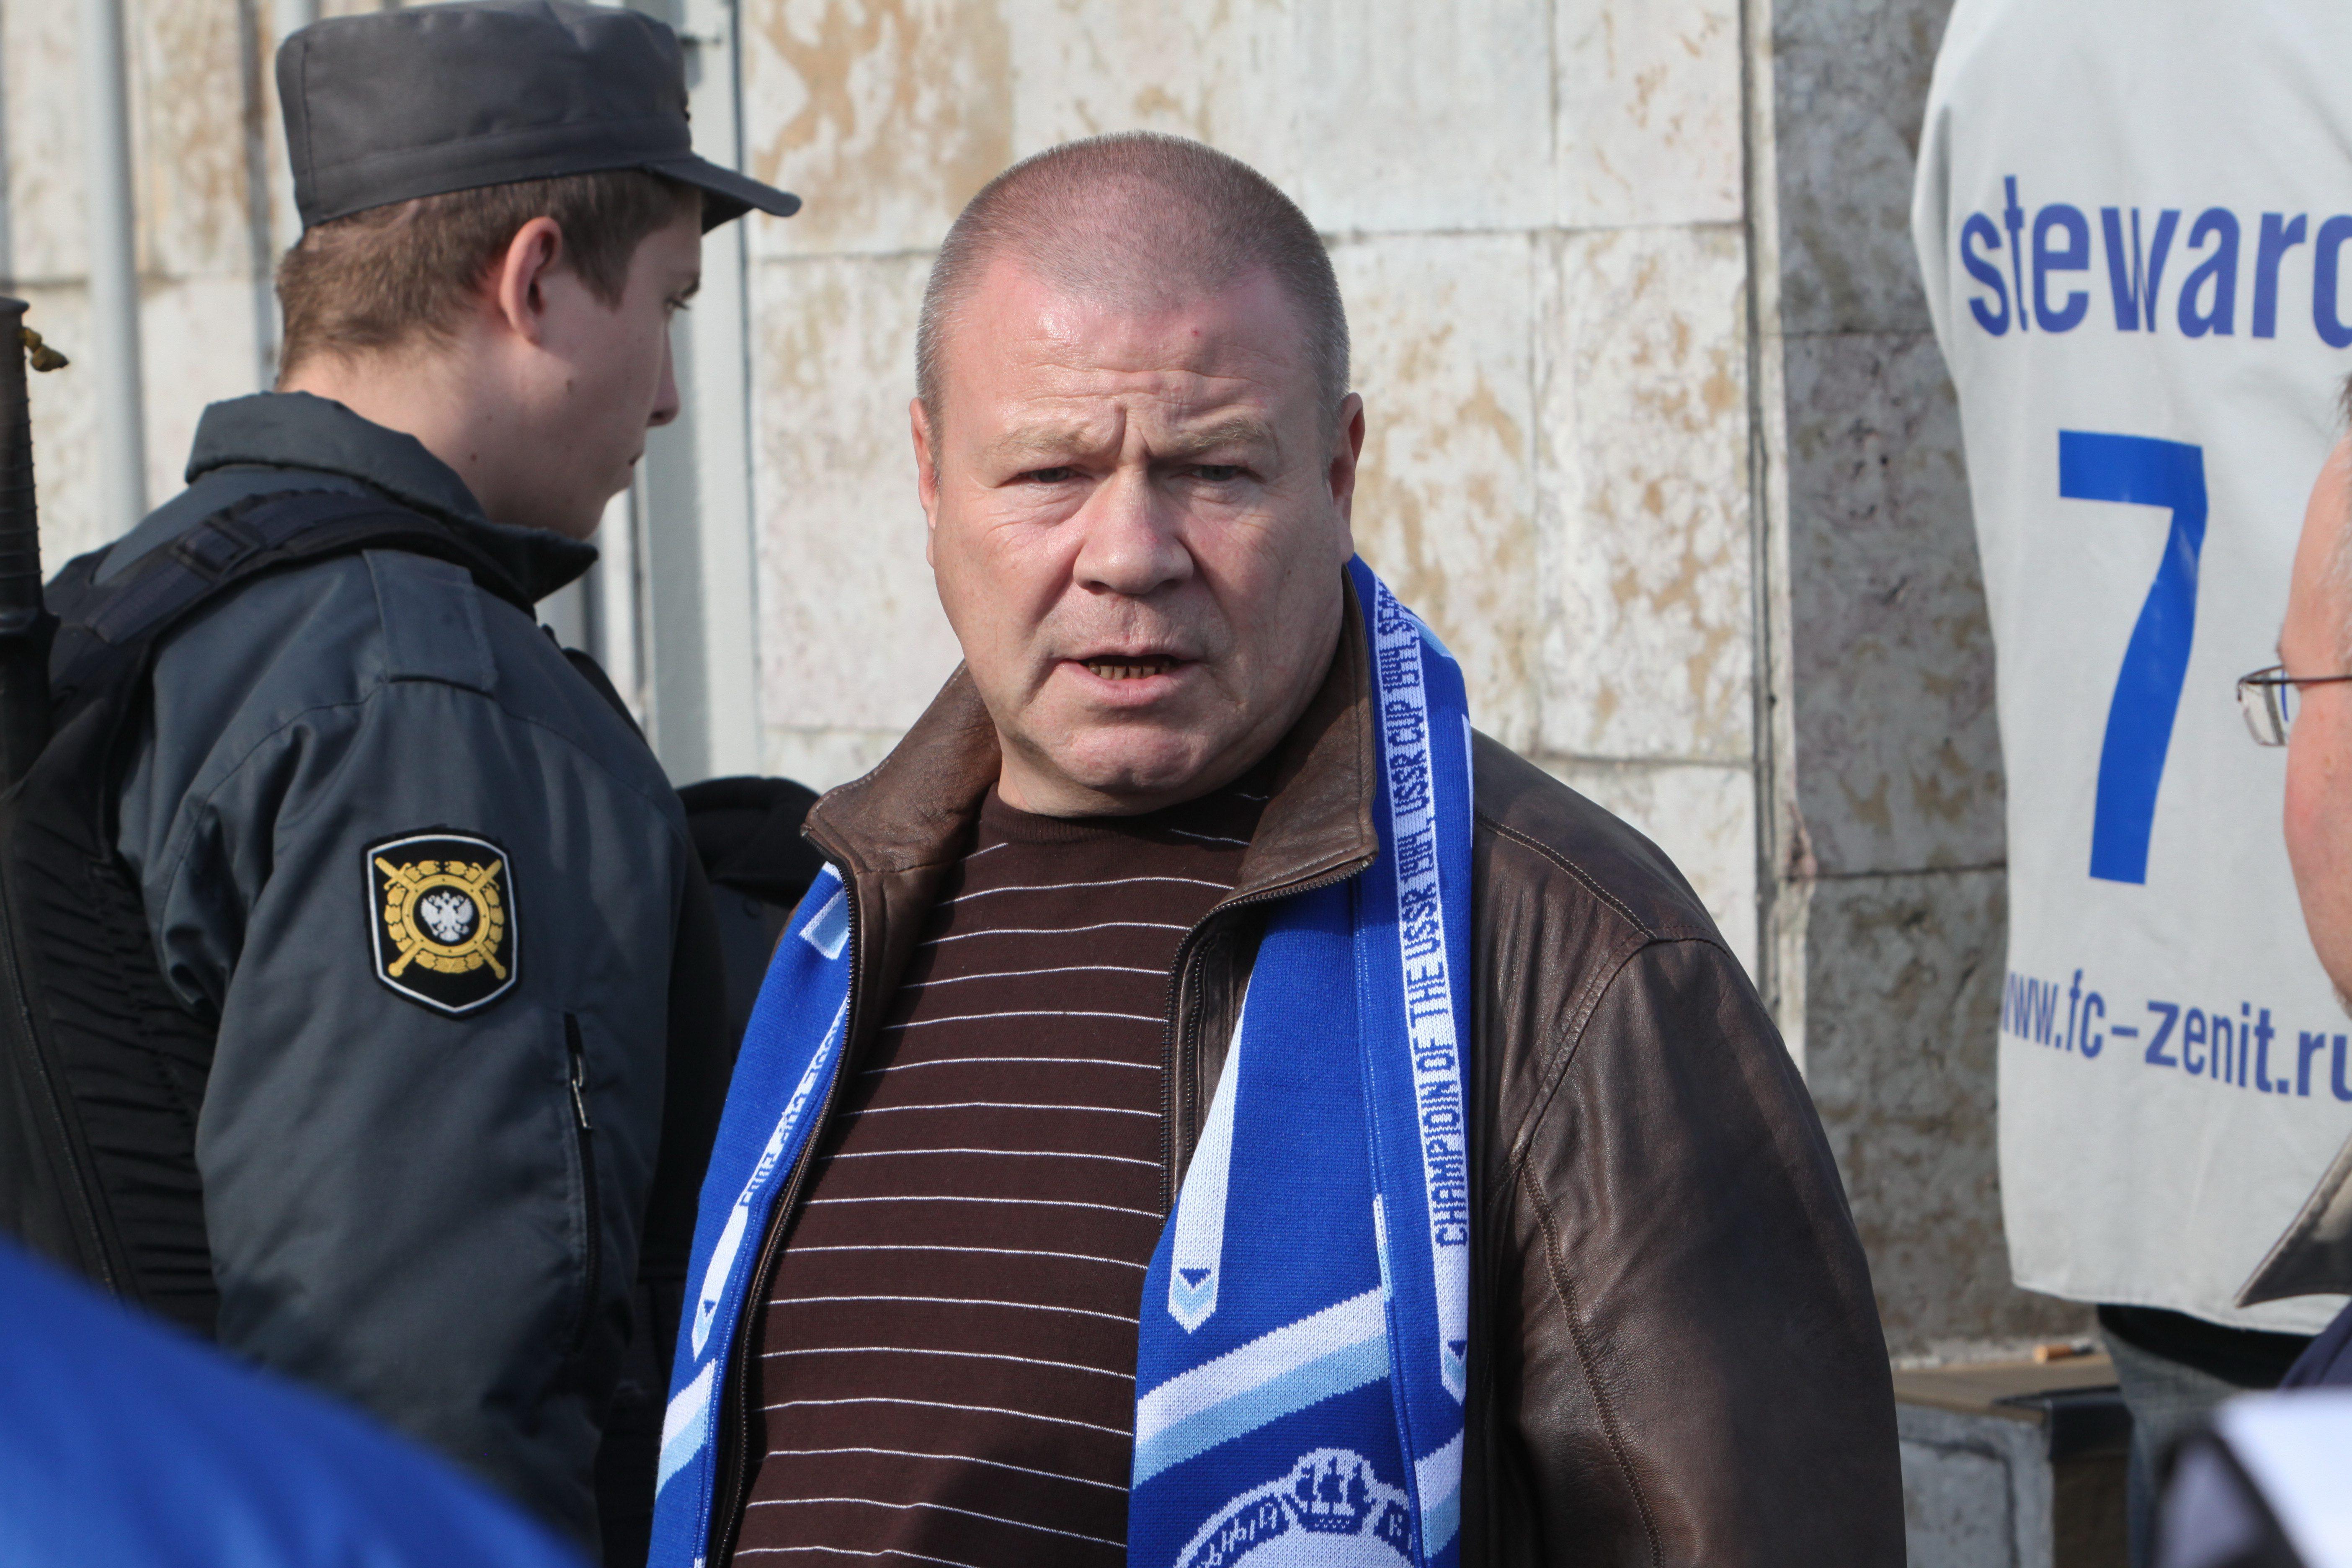 Сергей Селин: Жалко Халка нет, он бы нашвырял еще передач на голову Дзюбе